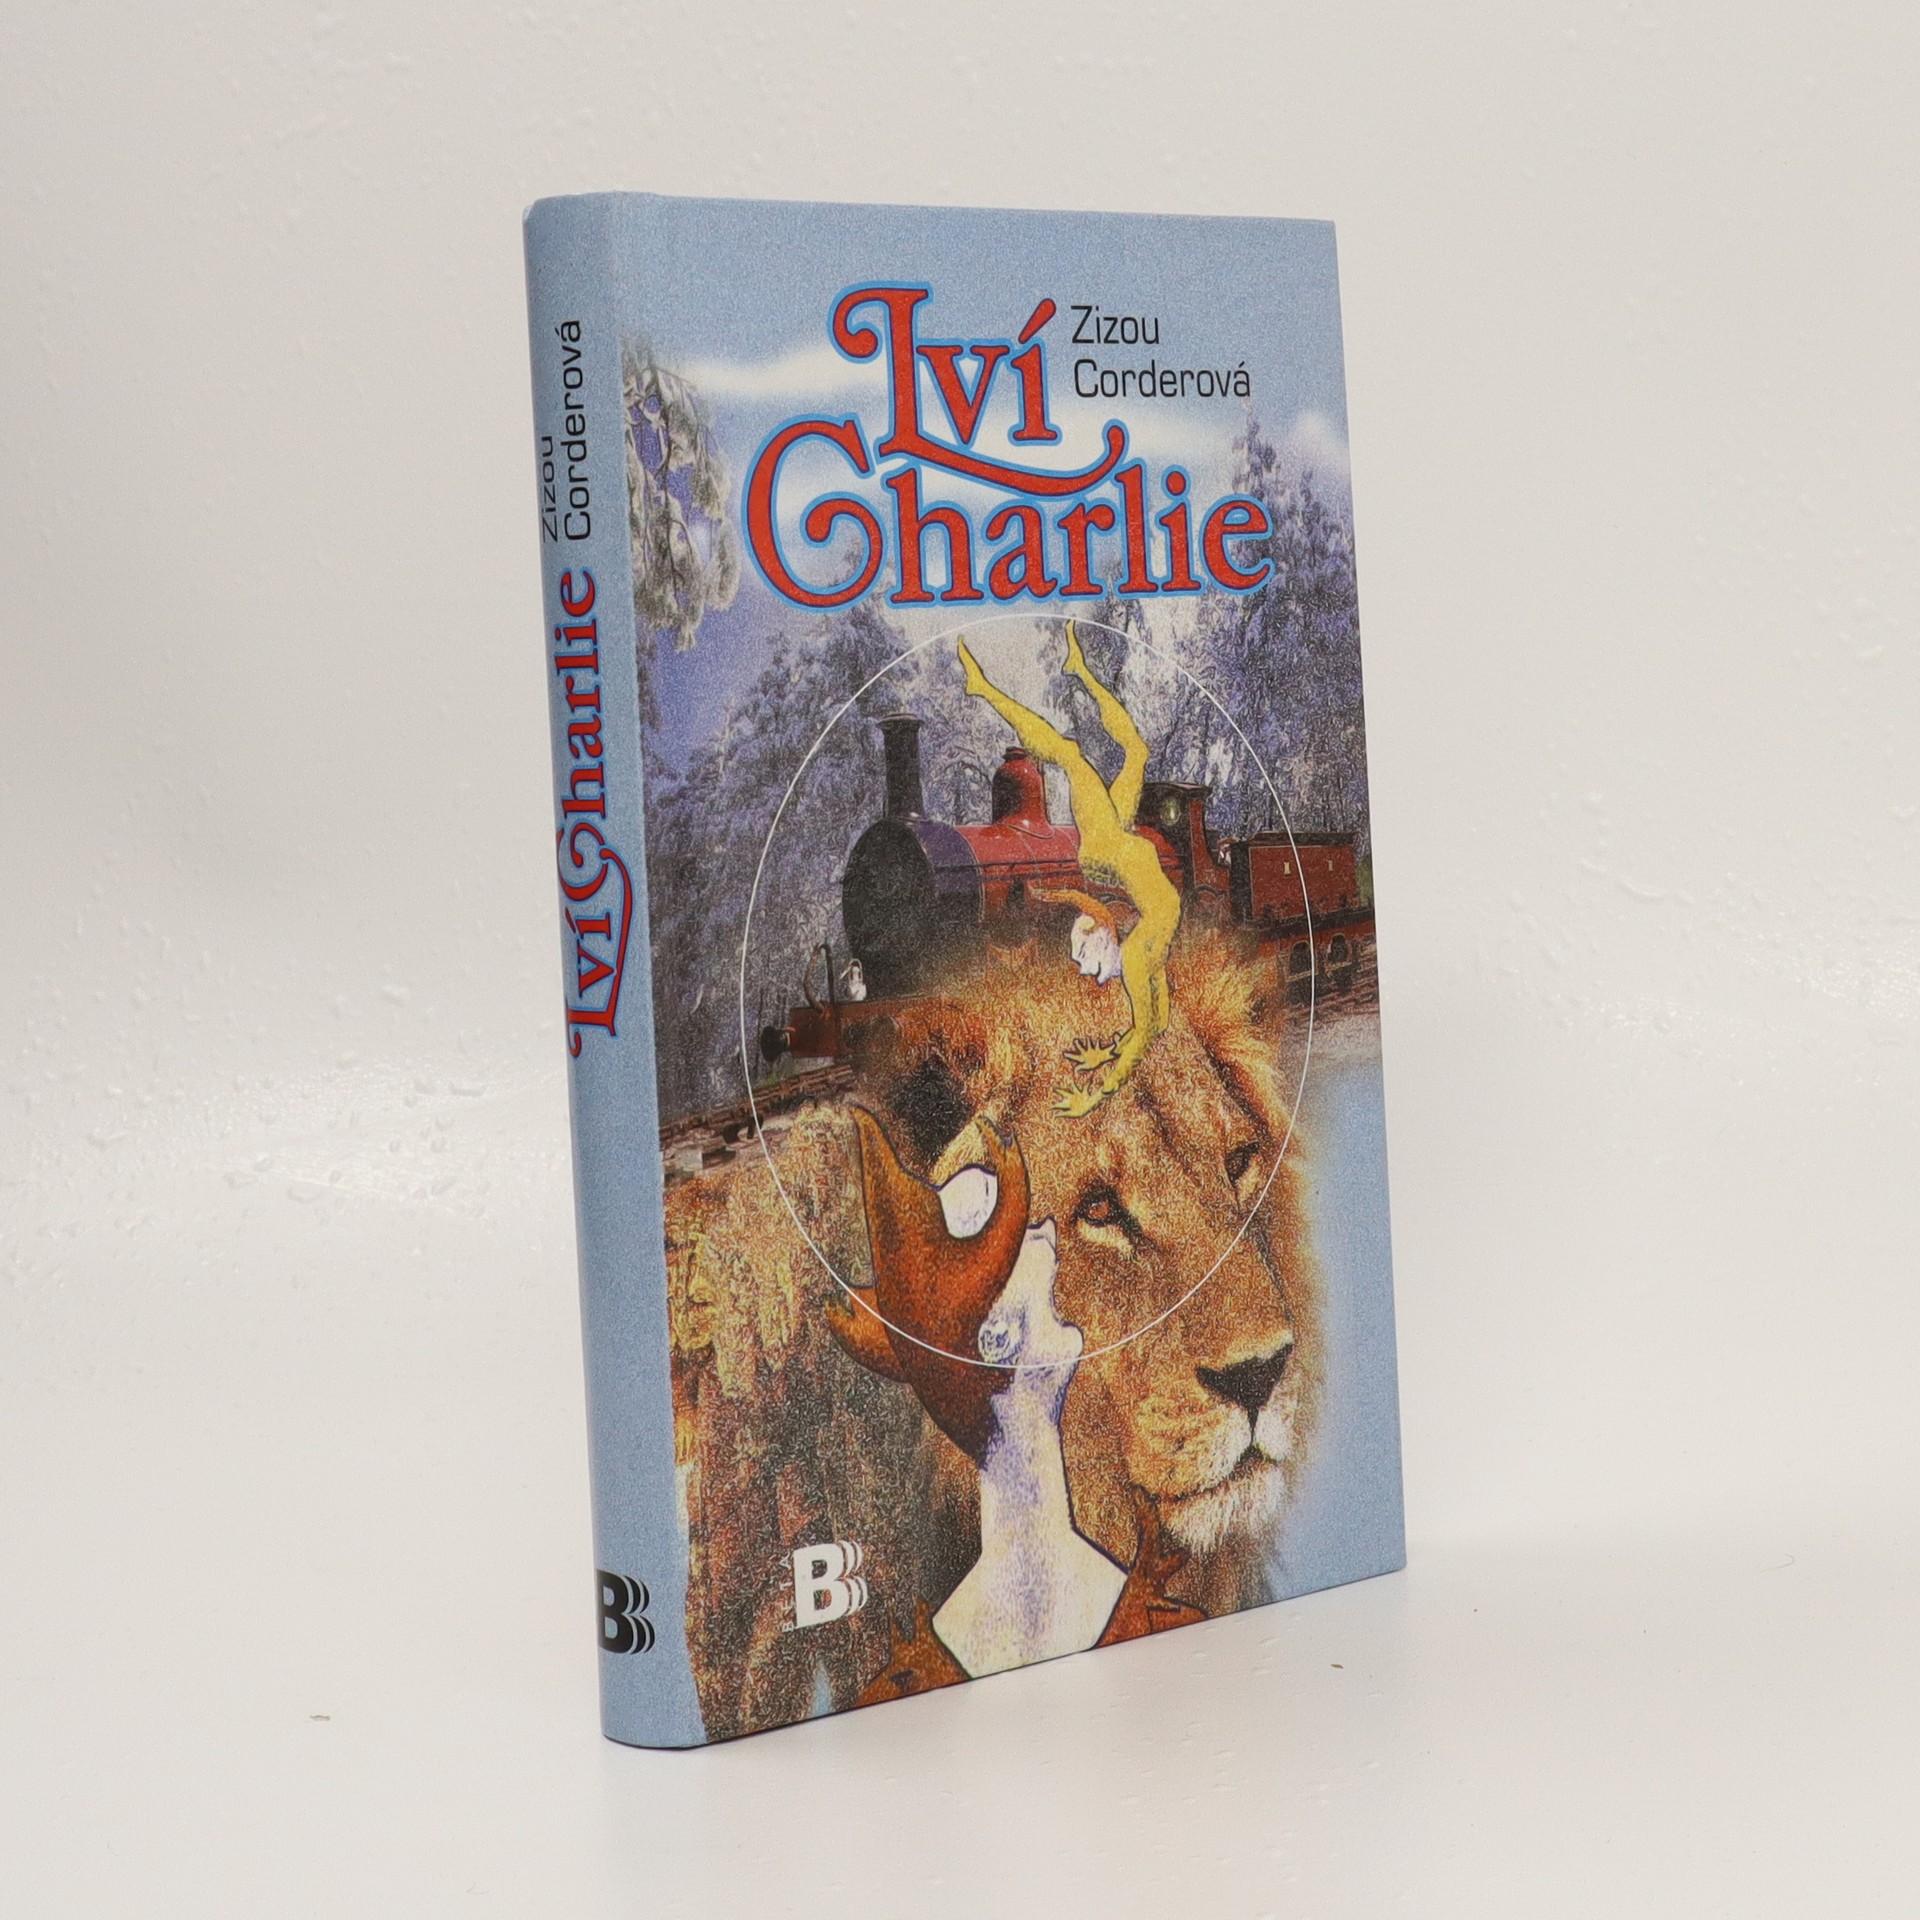 antikvární kniha Lví Charlie, 2004